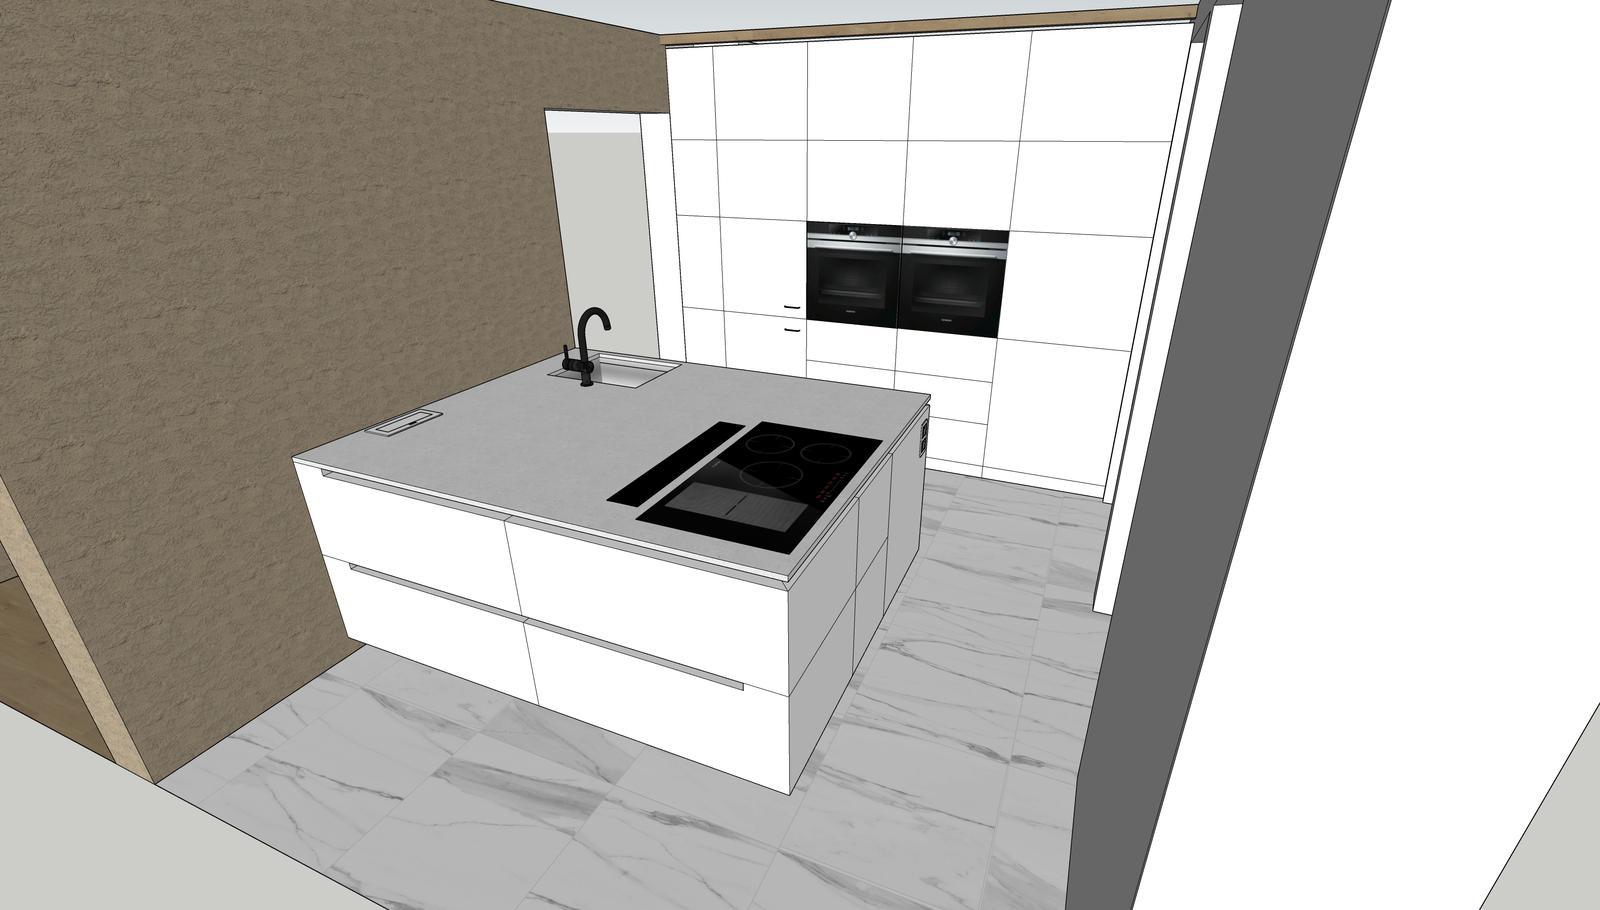 Naša cesta z mesta - Naša minimalistická kuchyňa :-) vizu